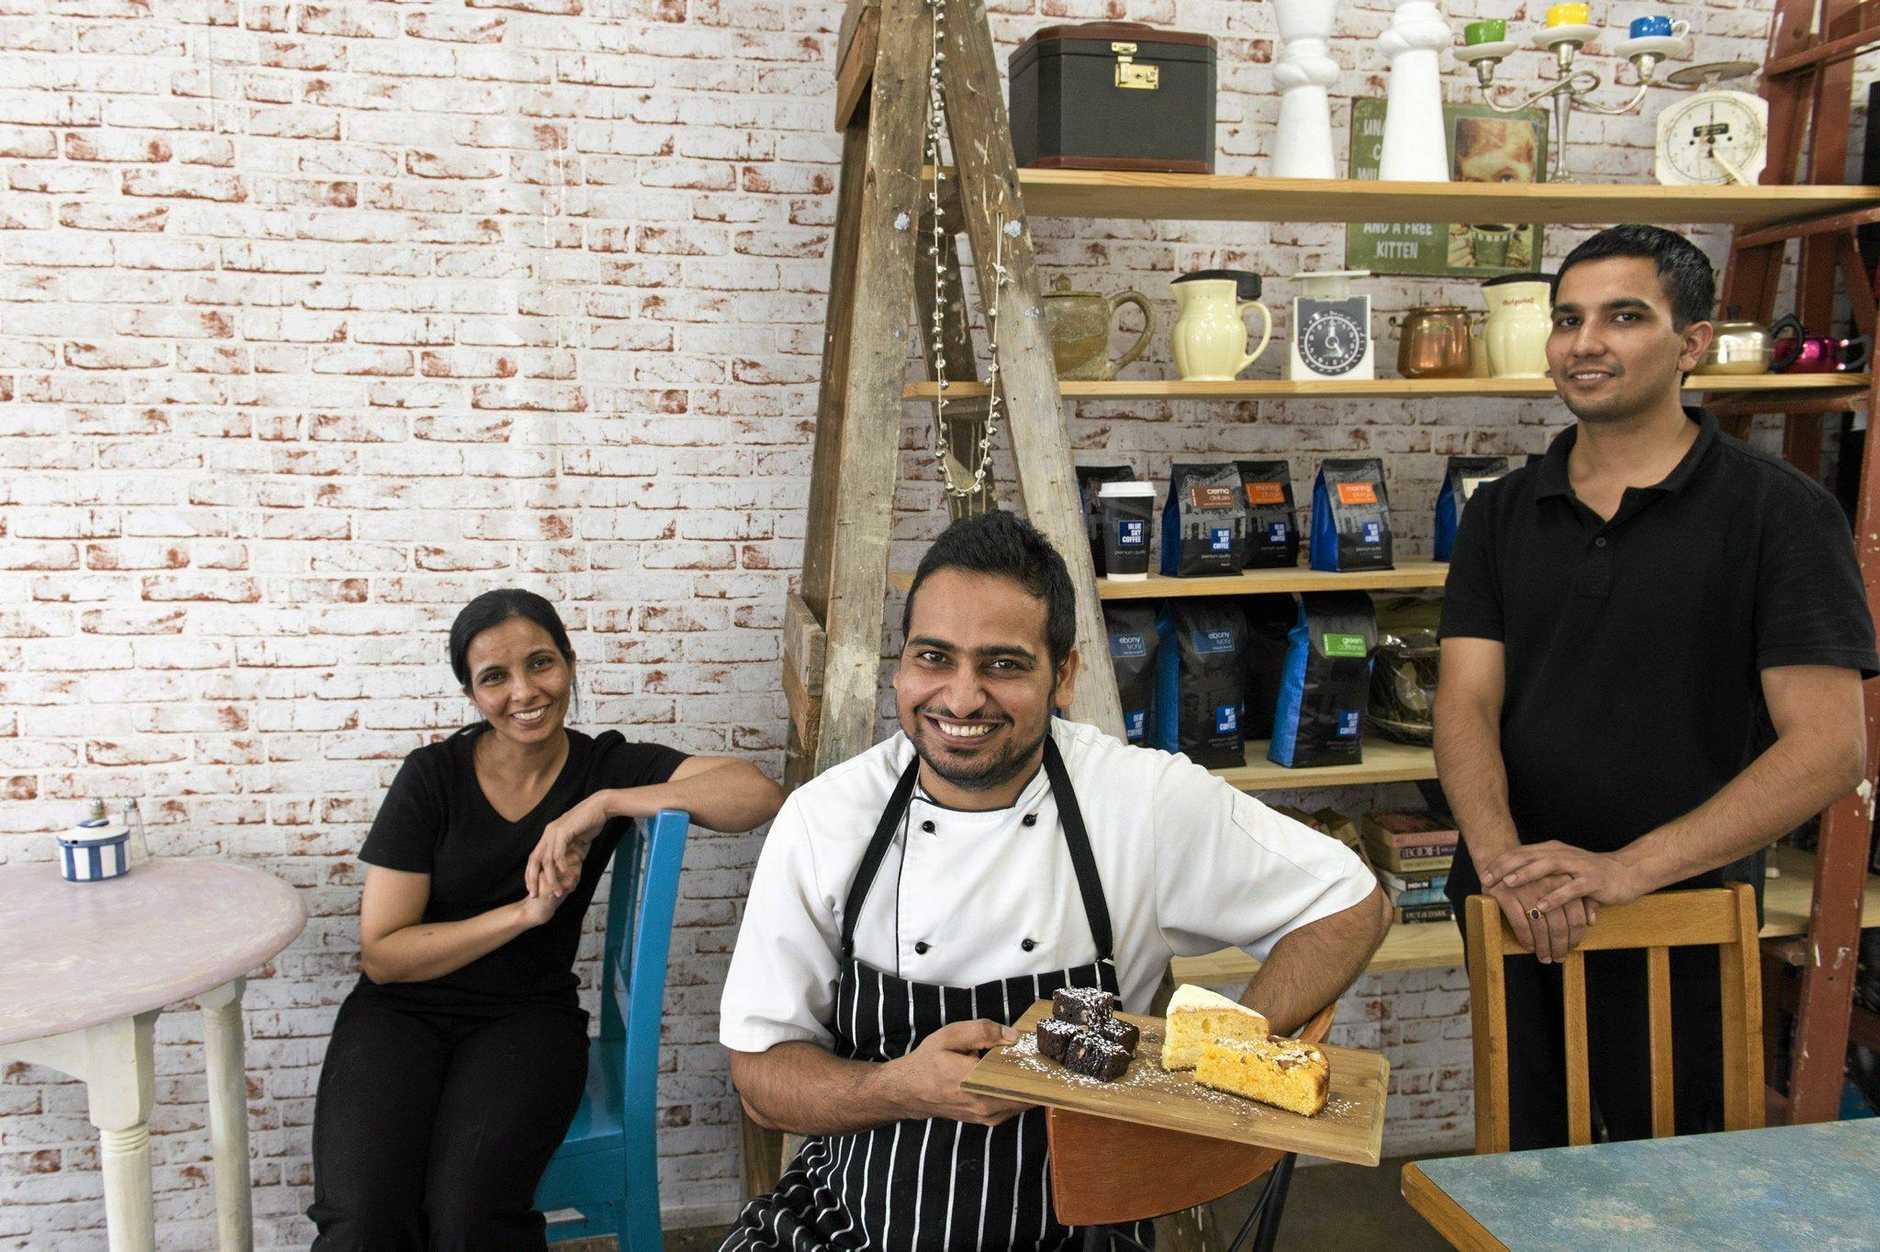 The Vintage Cafe owners Aman Randhawa and Raj Singh with staff member Garry Randhawa.